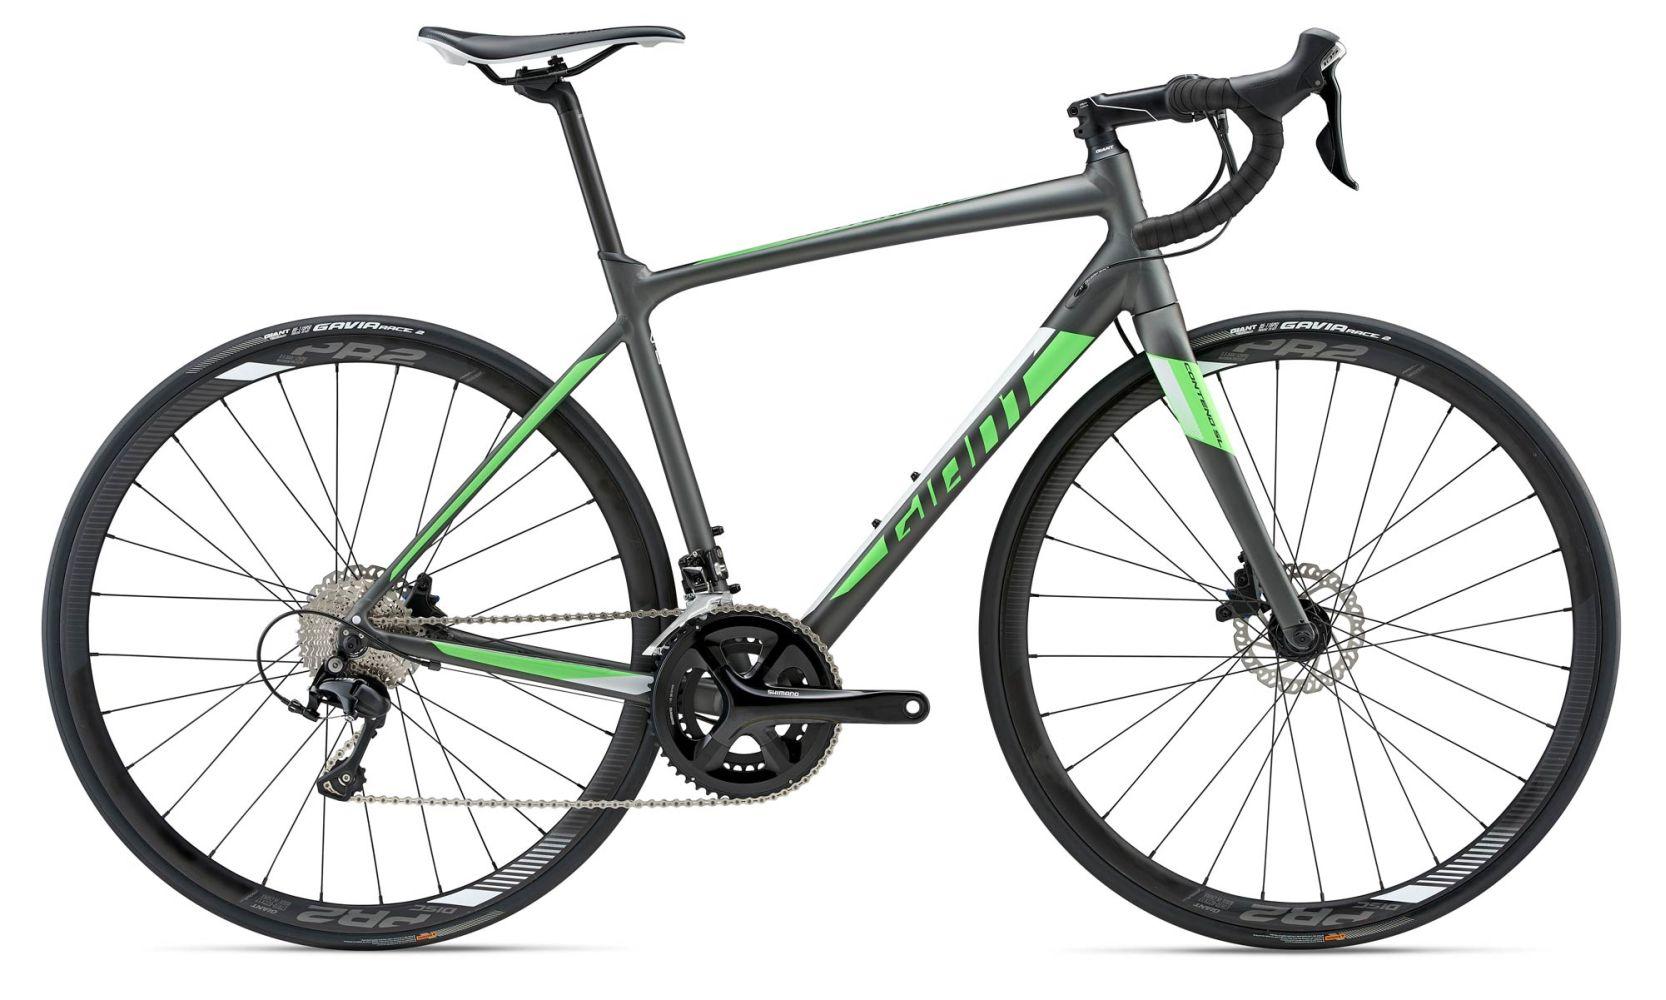 Giant Contend Sl 1 Disc Road Bike In Charcoal 959 20